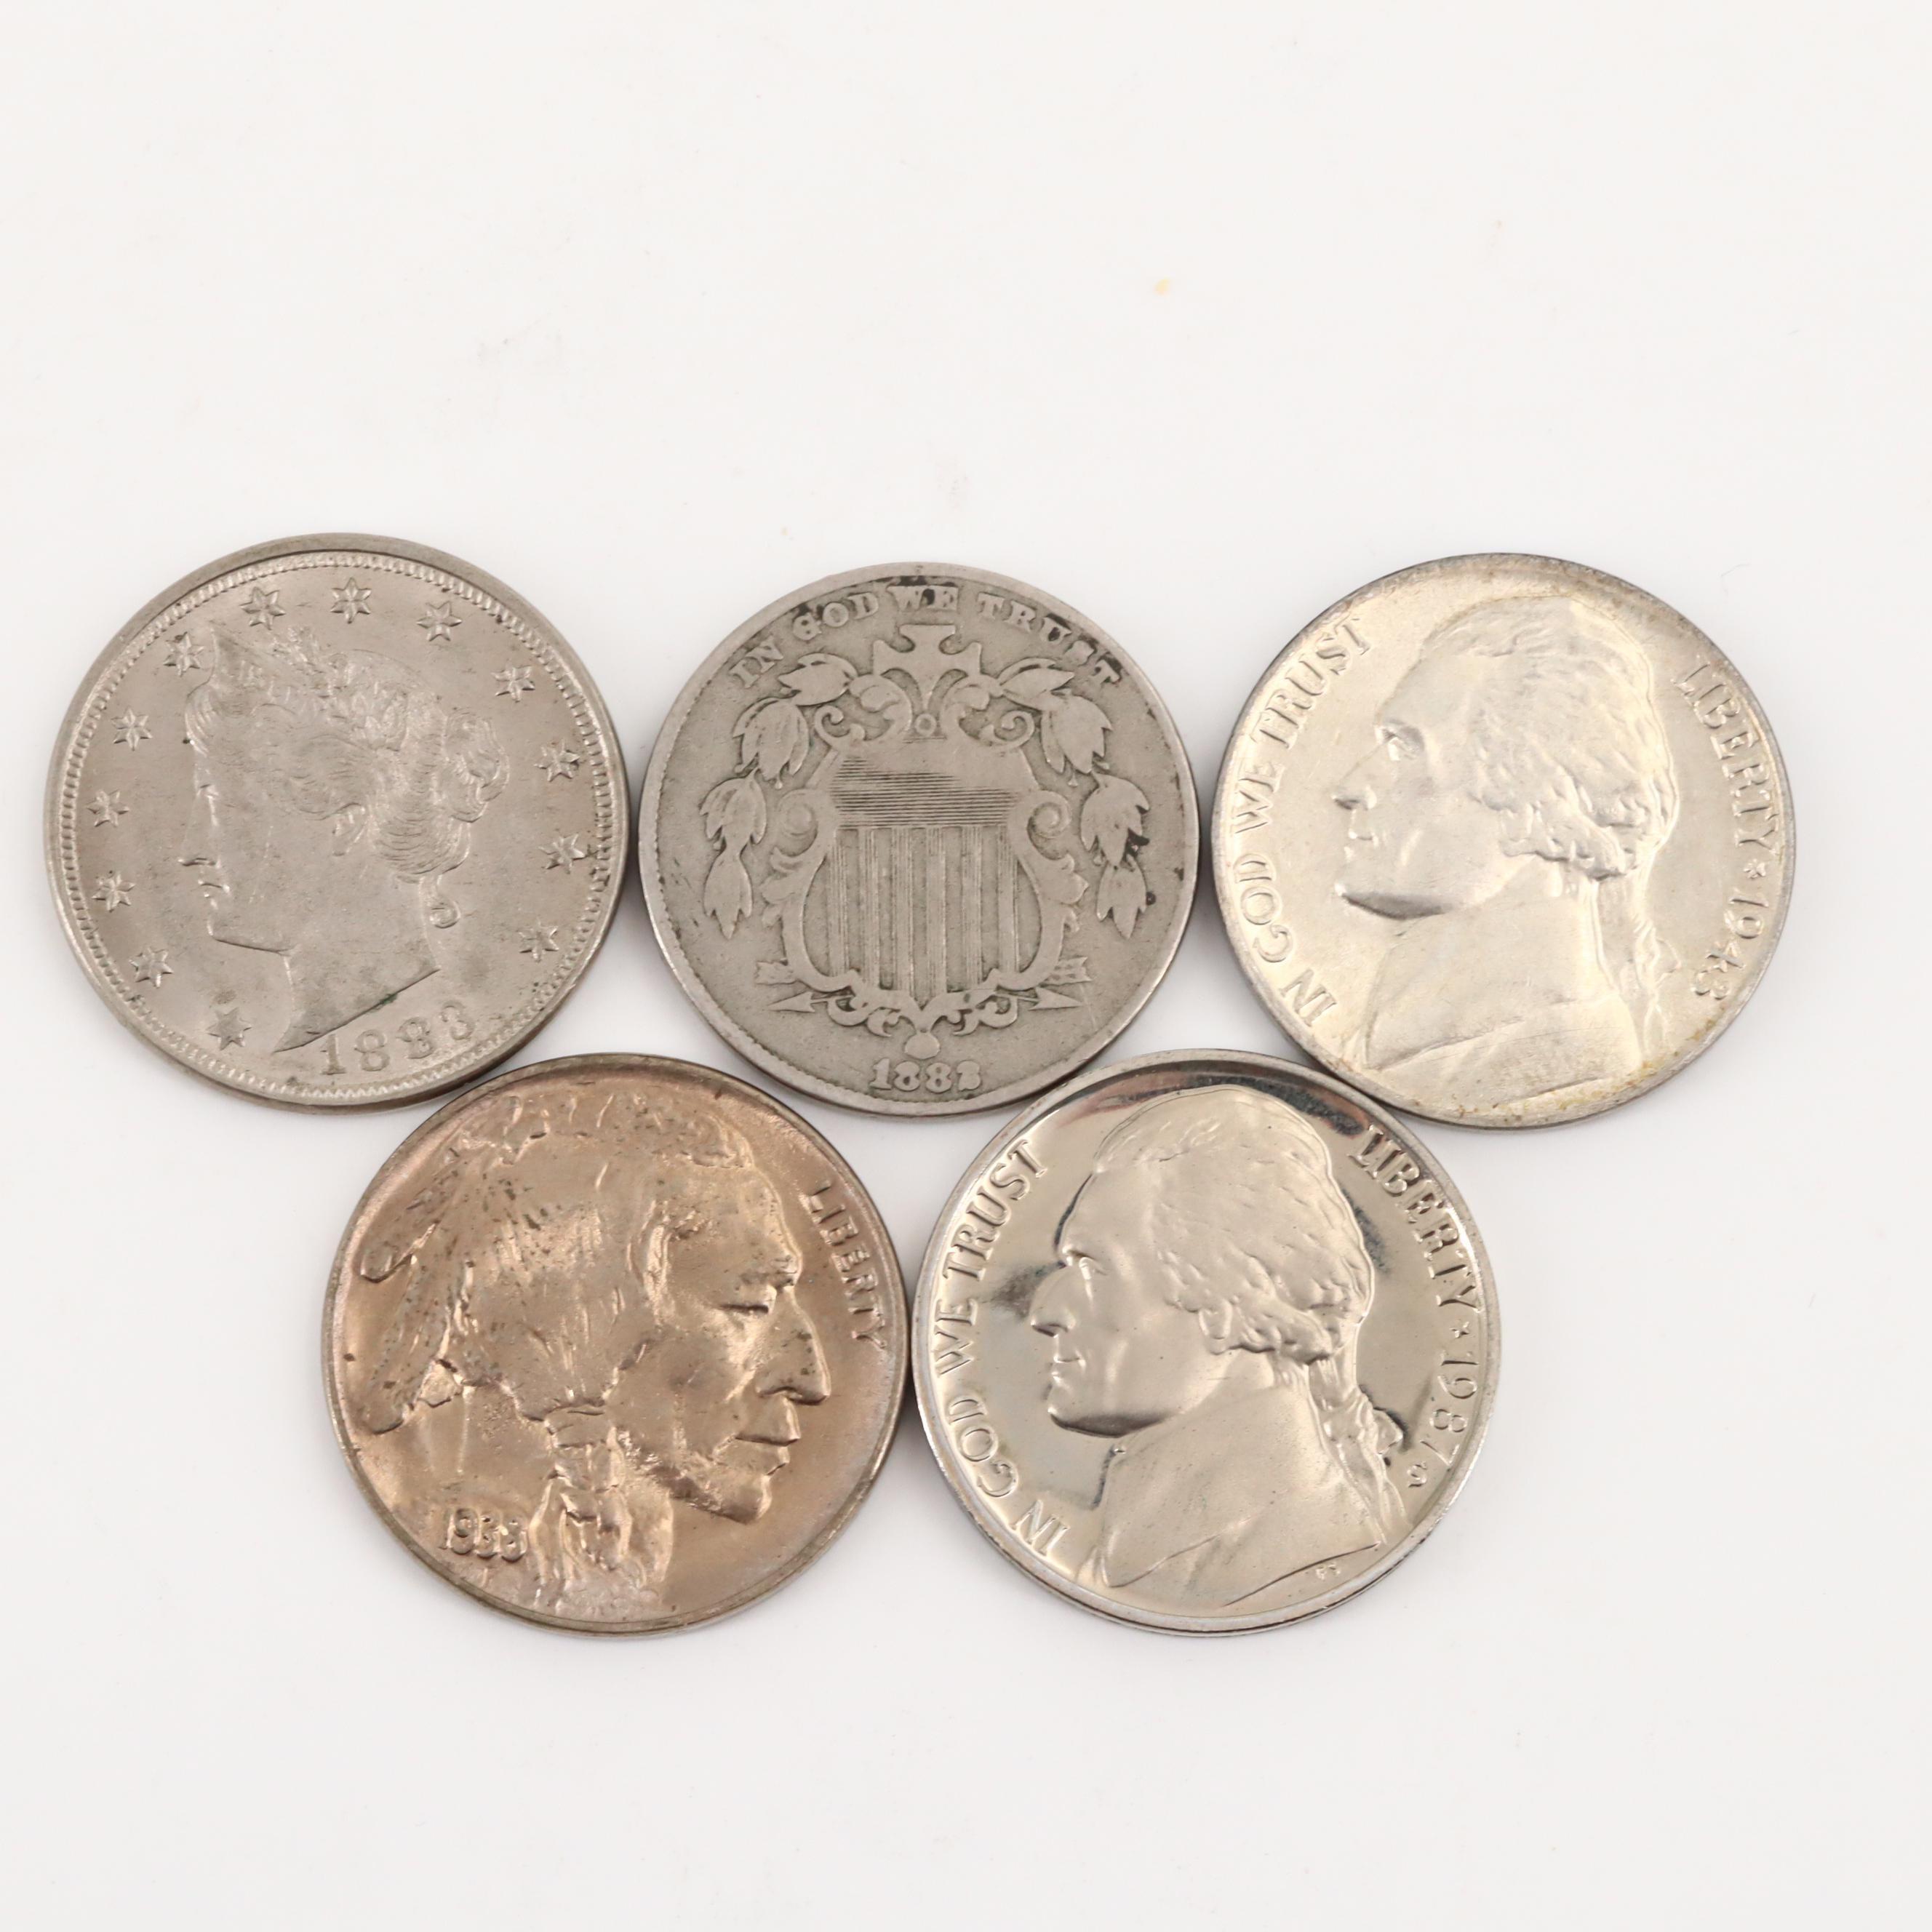 Five U.S. Type Nickels, 1882 to 1987